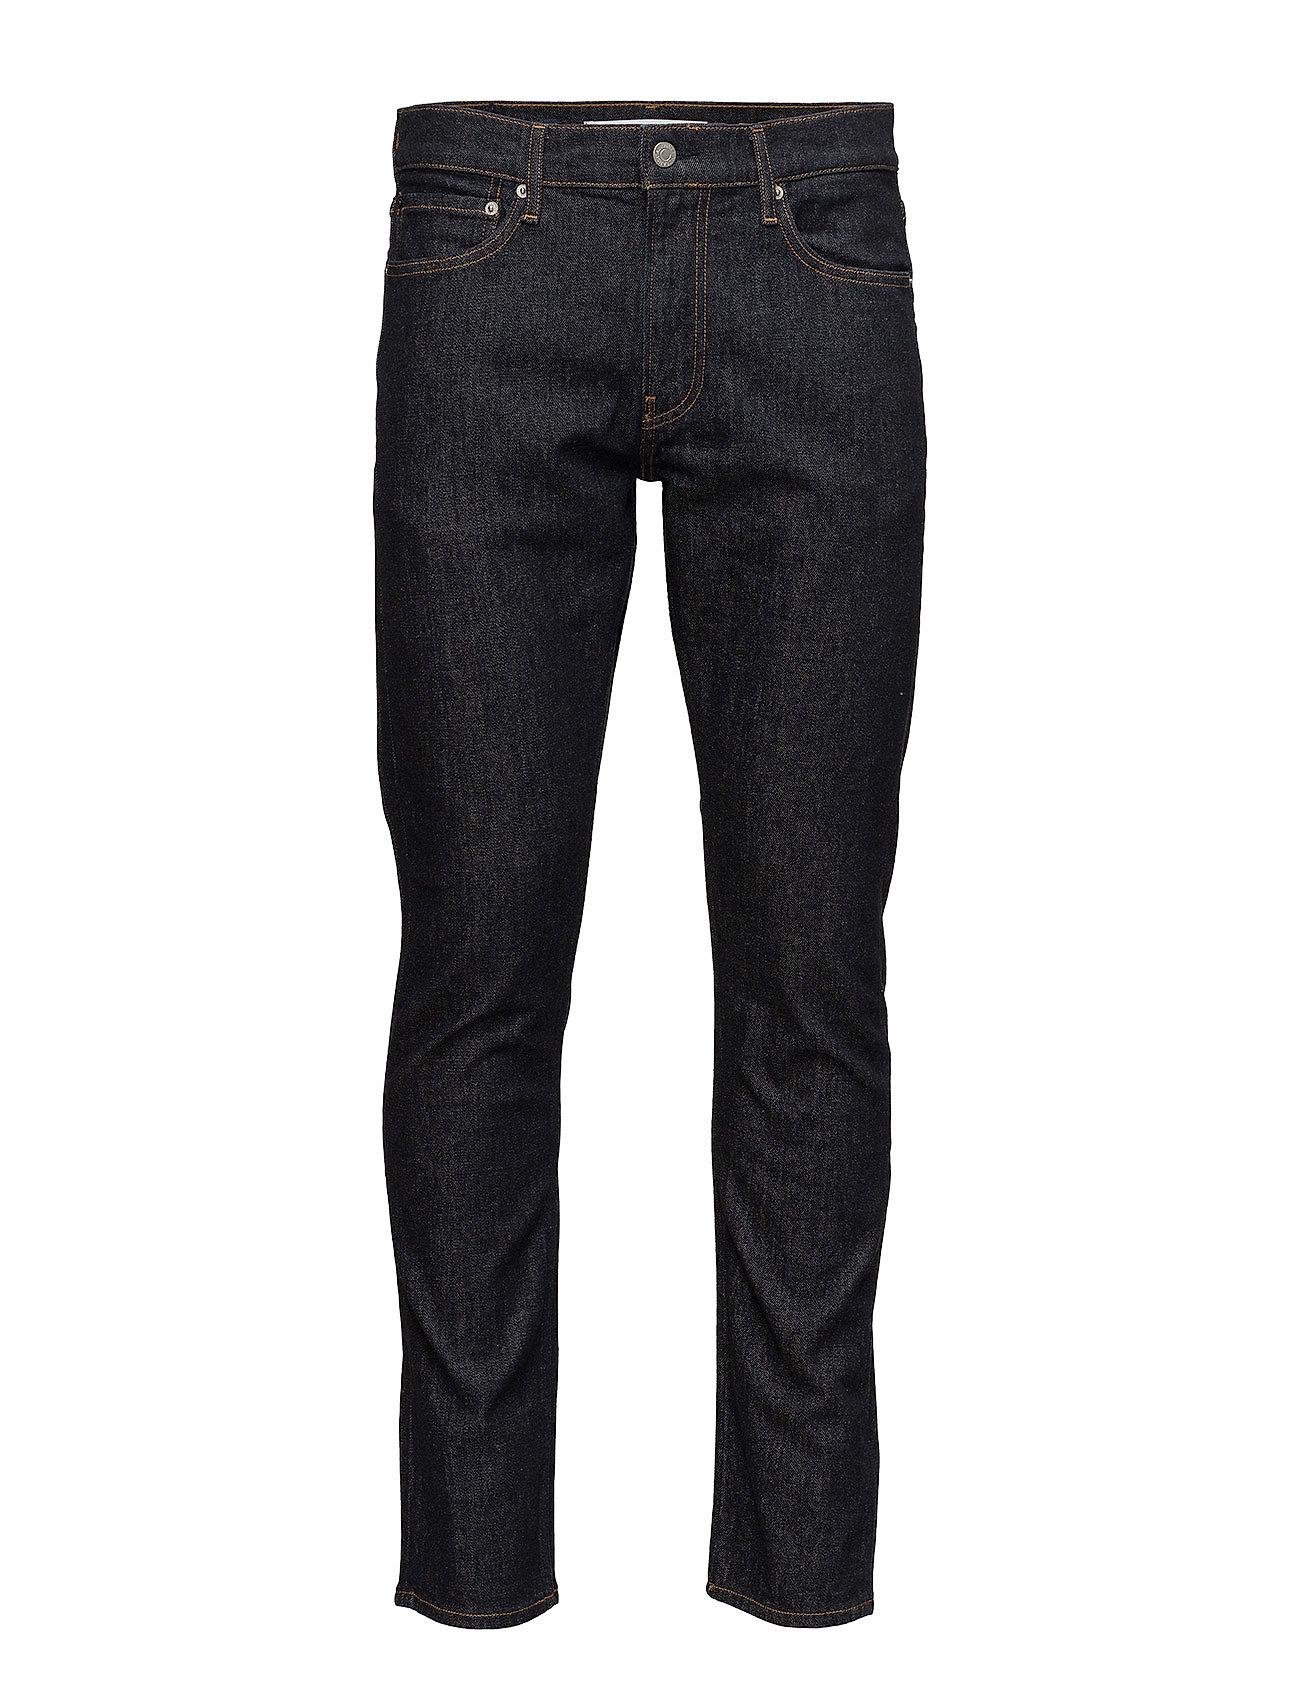 Calvin Klein Jeans CKJ 026 SLIM - ANTWERP RINSE